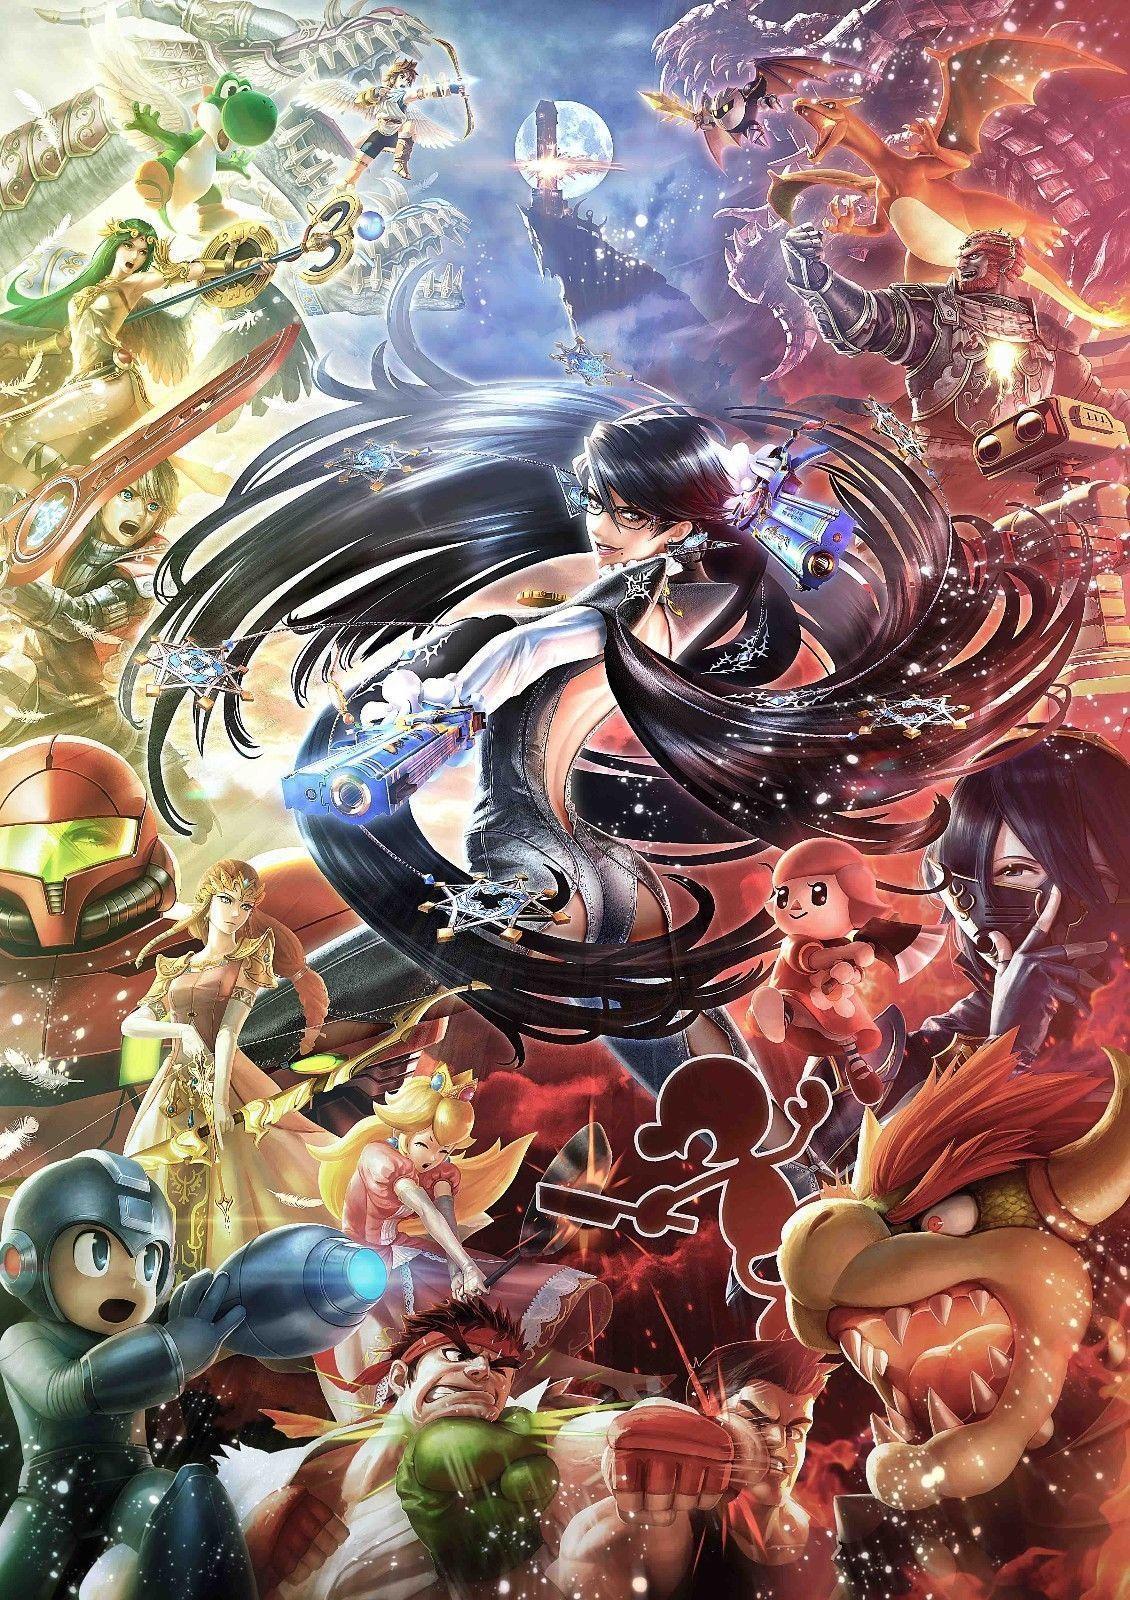 6 35 Bayonetta Super Smash Art Silk Poster 12x18 24x36 24x43 Ebay Collectibles Smash Bros Smash Brothers Super Smash Bros